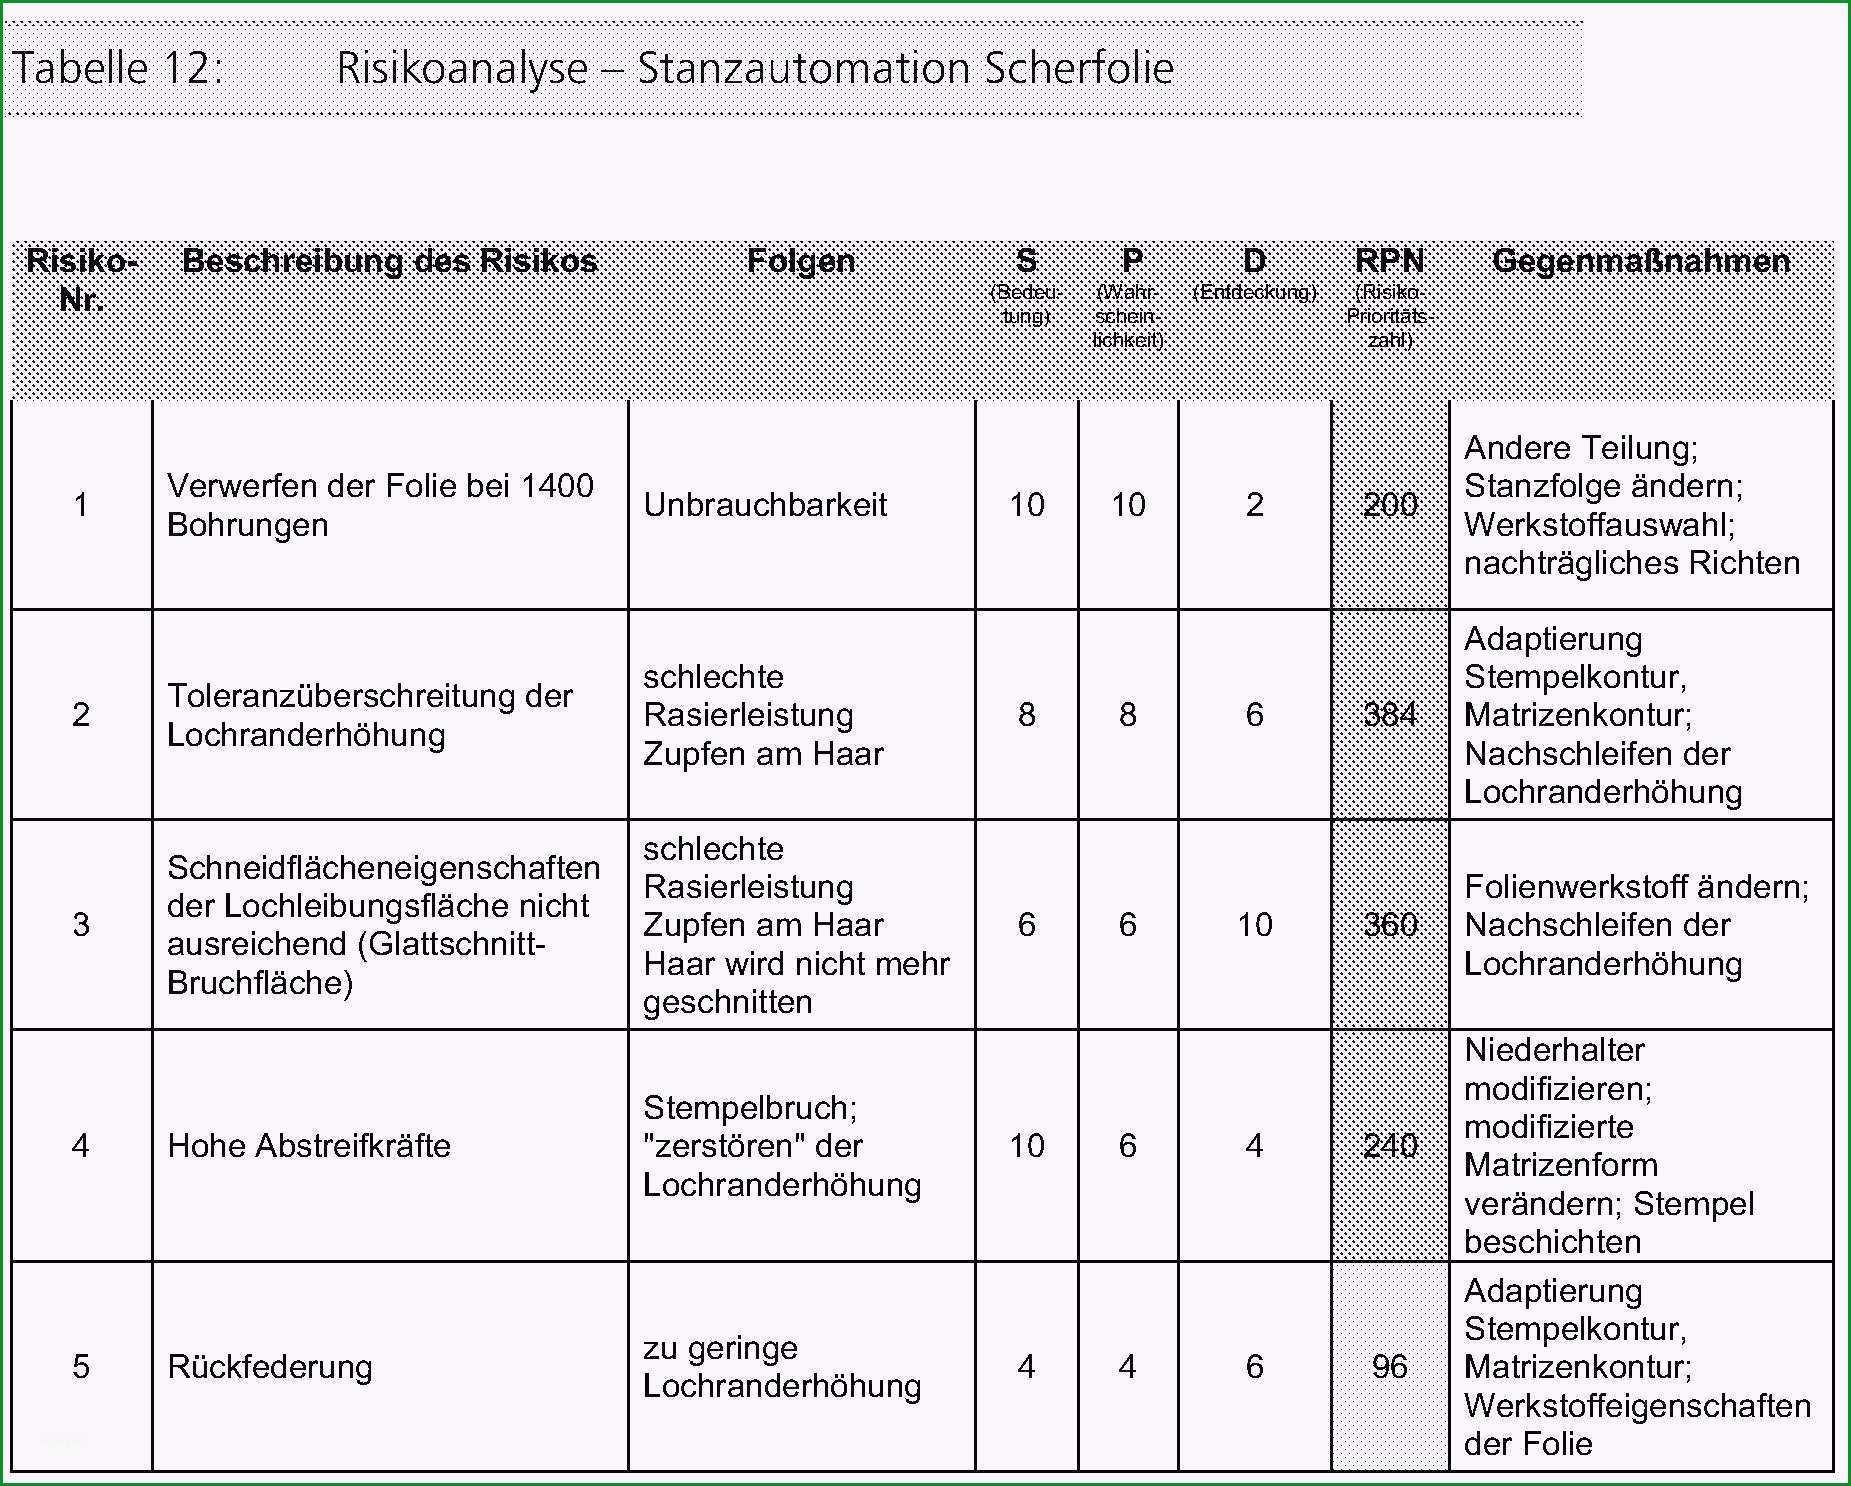 risikoanalyse lebensmittel vorlage gegenwart 15 risikoanalyse muster deaddrop nyc